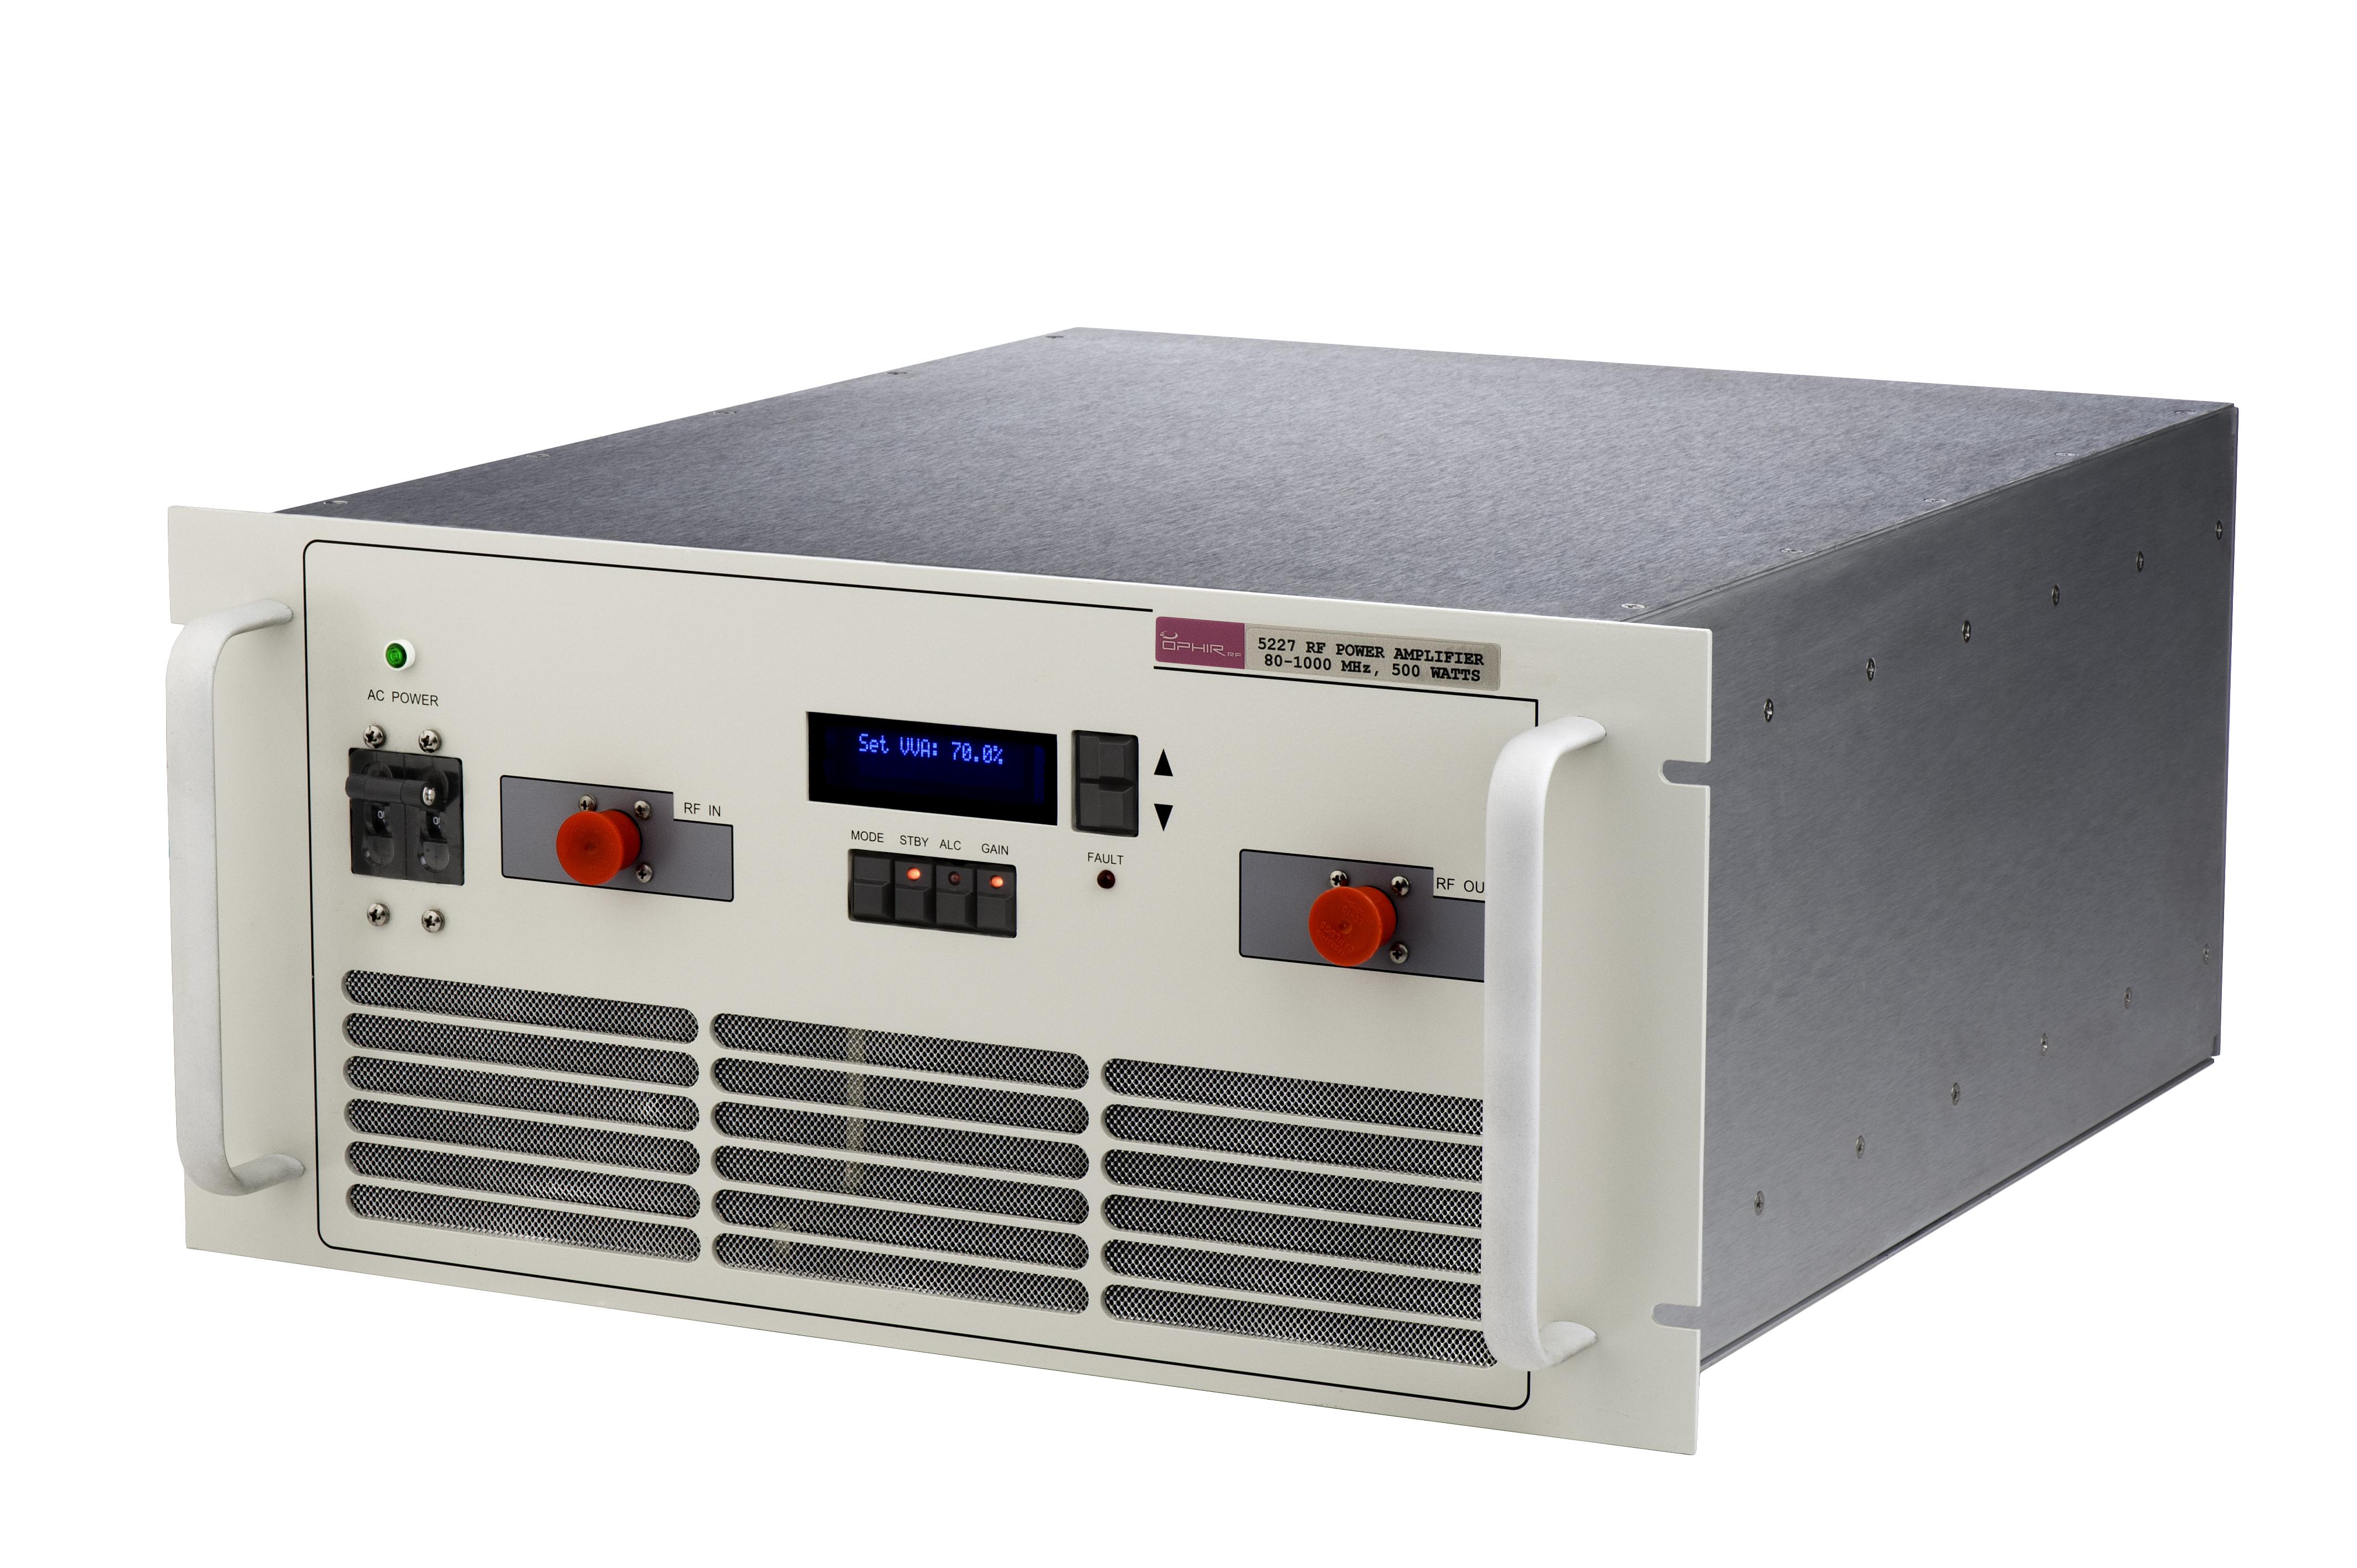 Broadband Rf Power Amplifier Model 7000 Amp Image